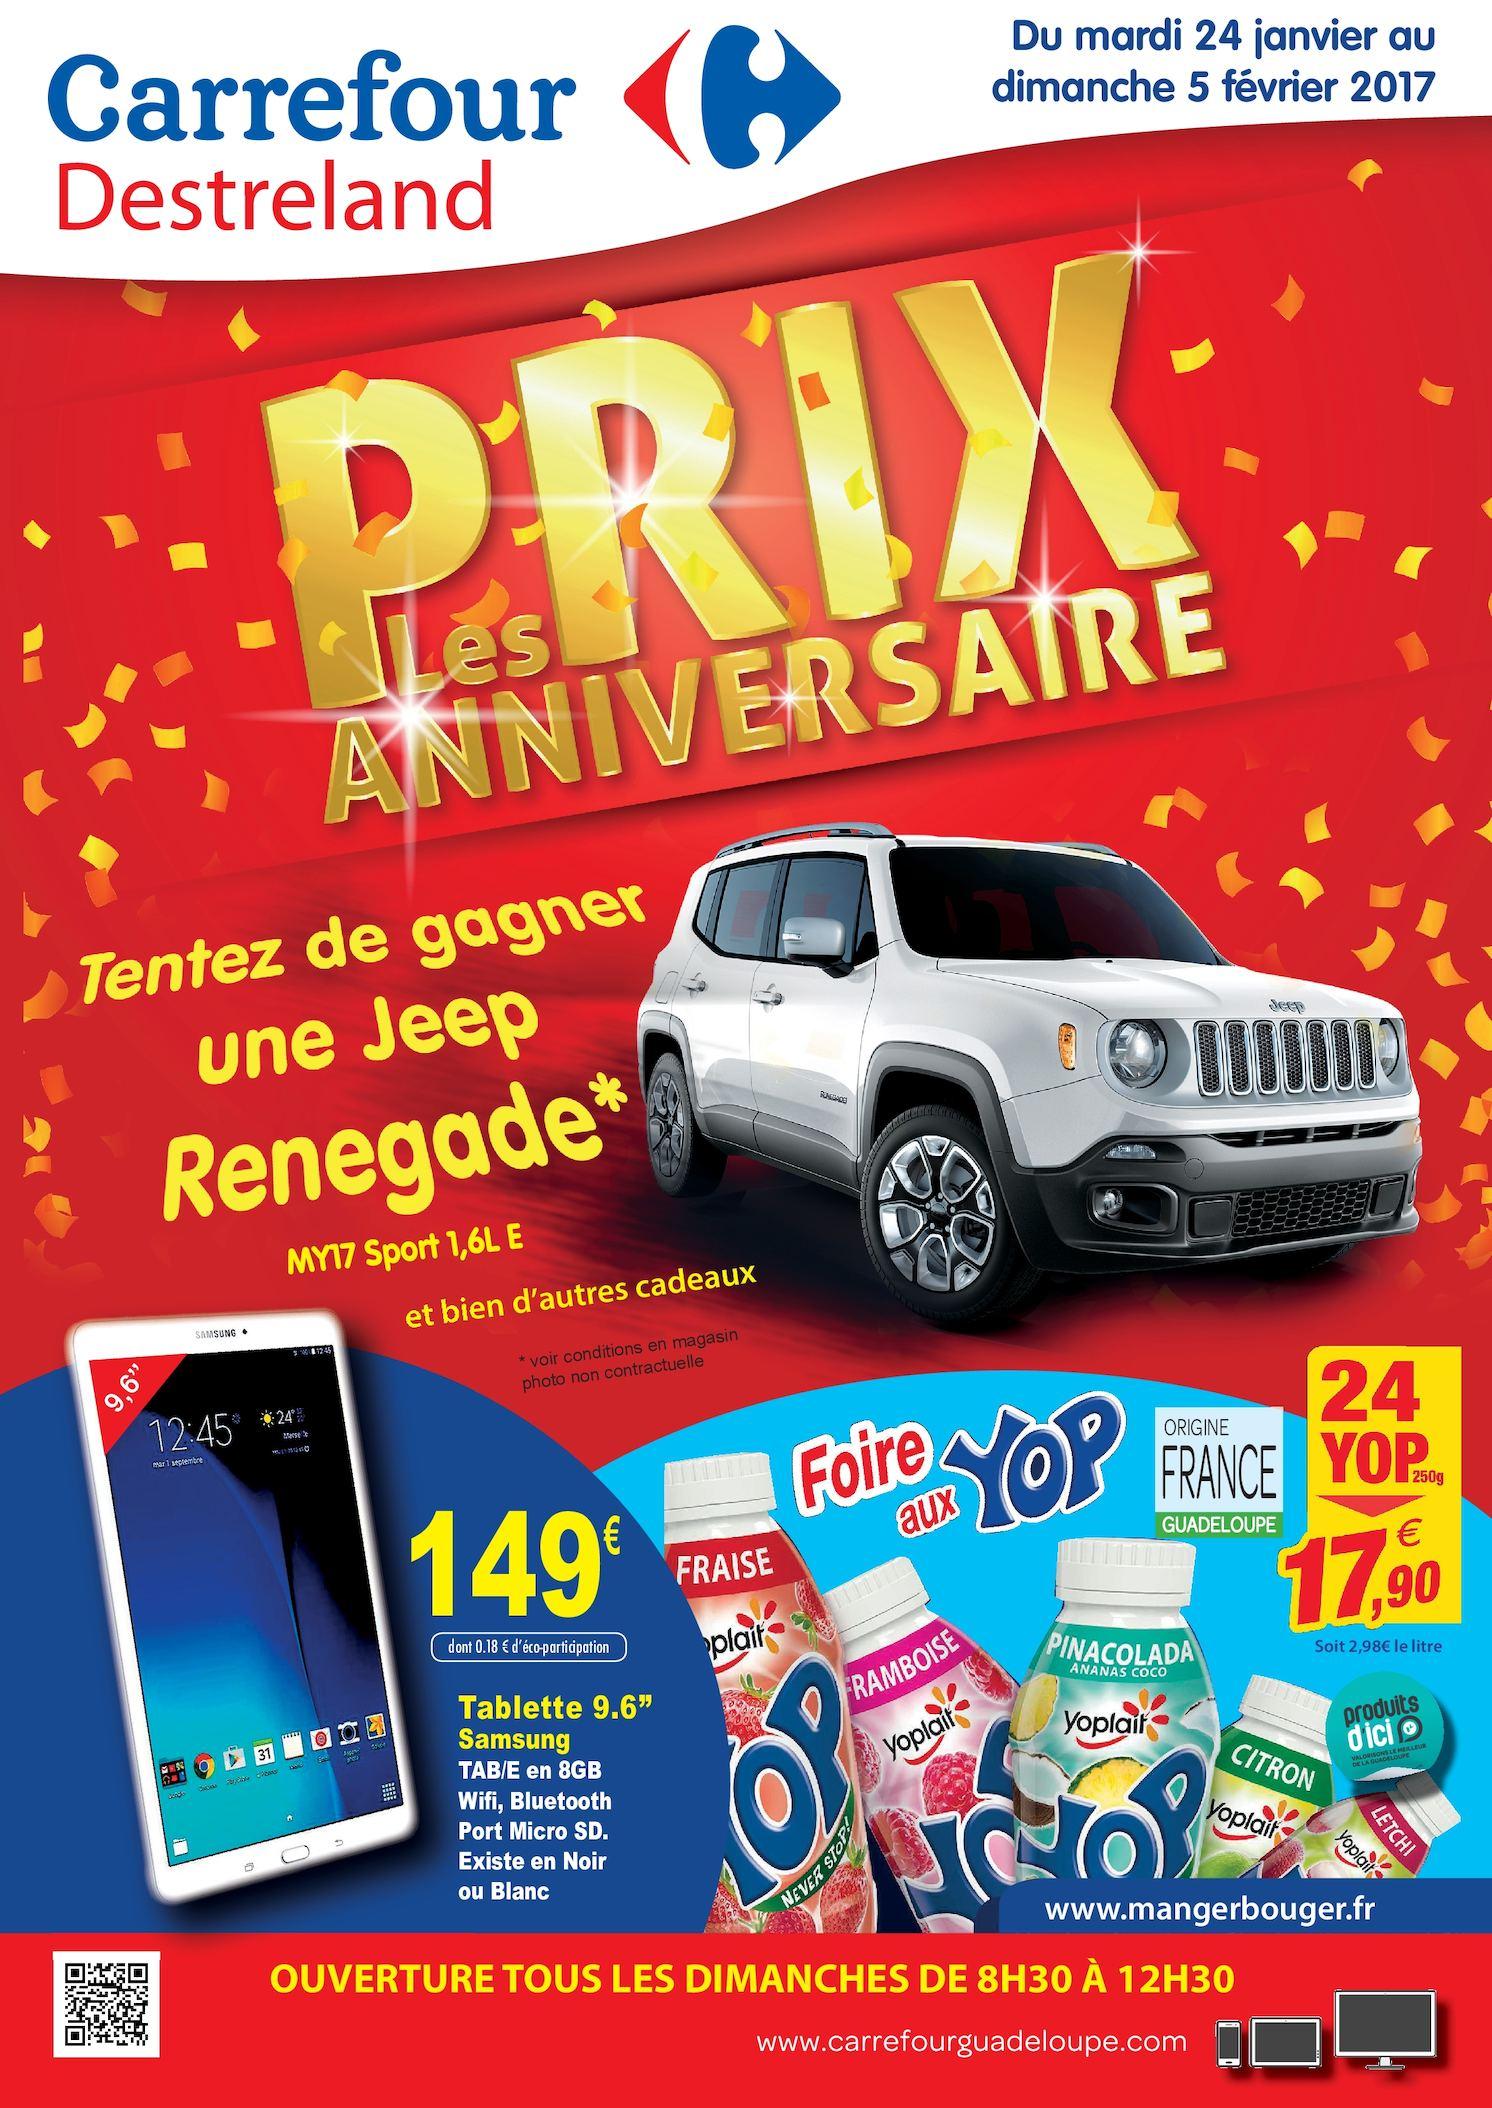 Calaméo Carrefour Destreland Catalogue Anniversaire 0117